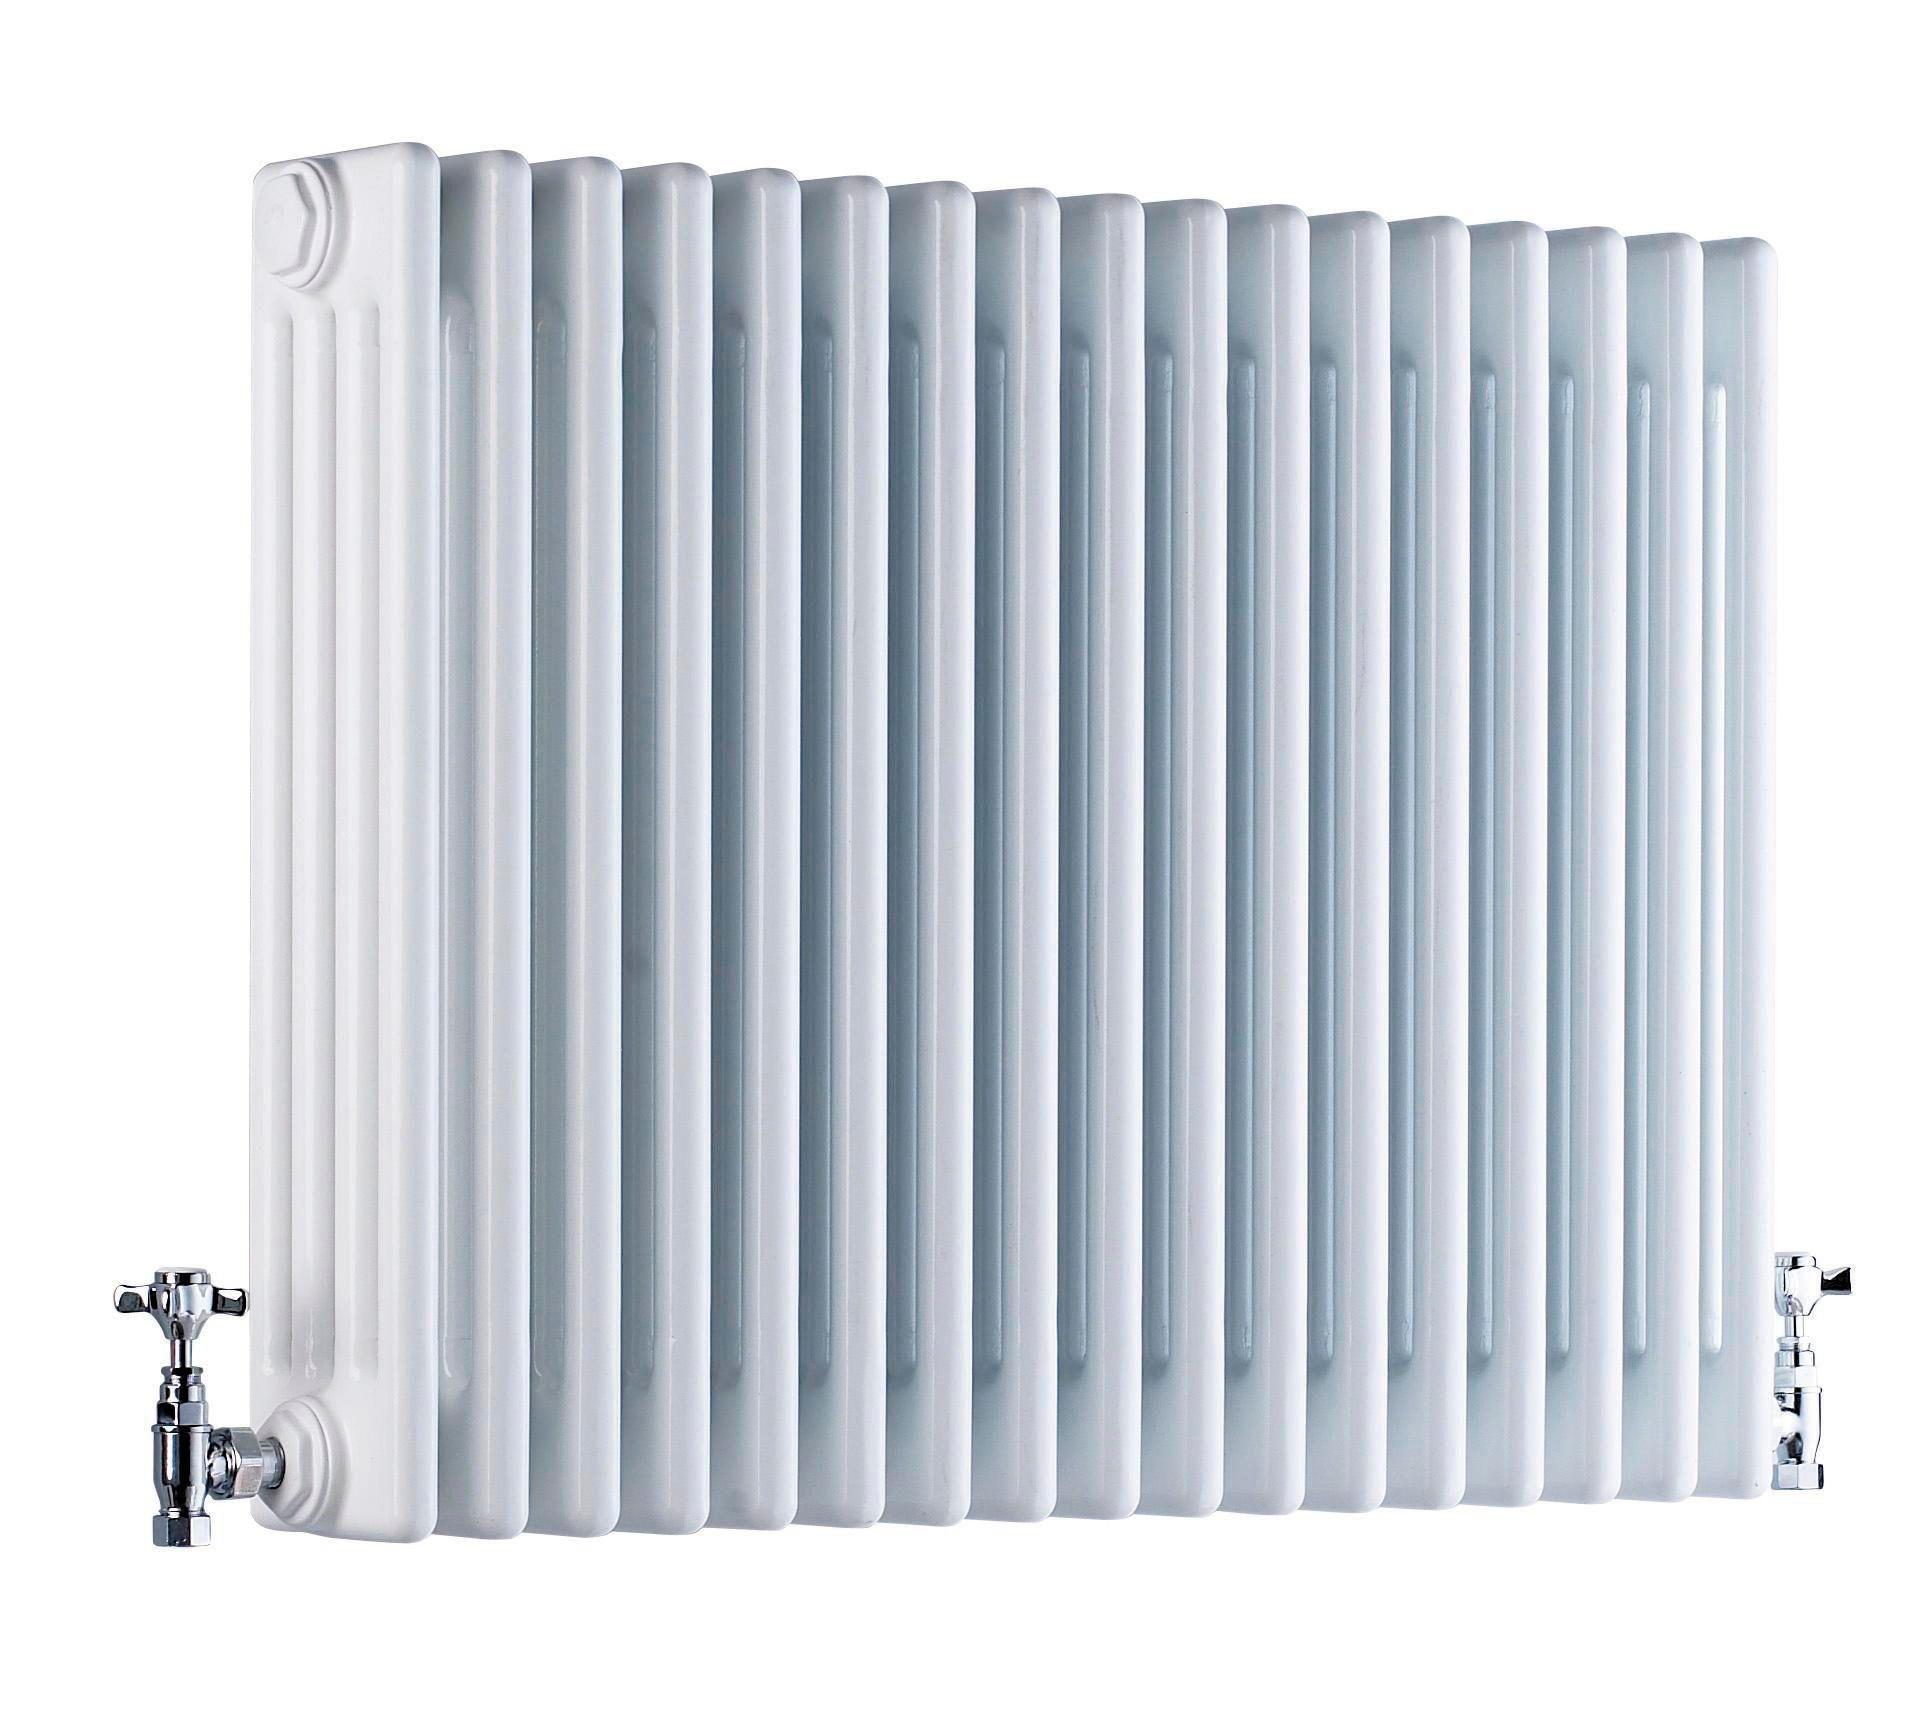 Acova 4 Column radiator, White (W)628mm (H)600mm | Departments | DIY ...